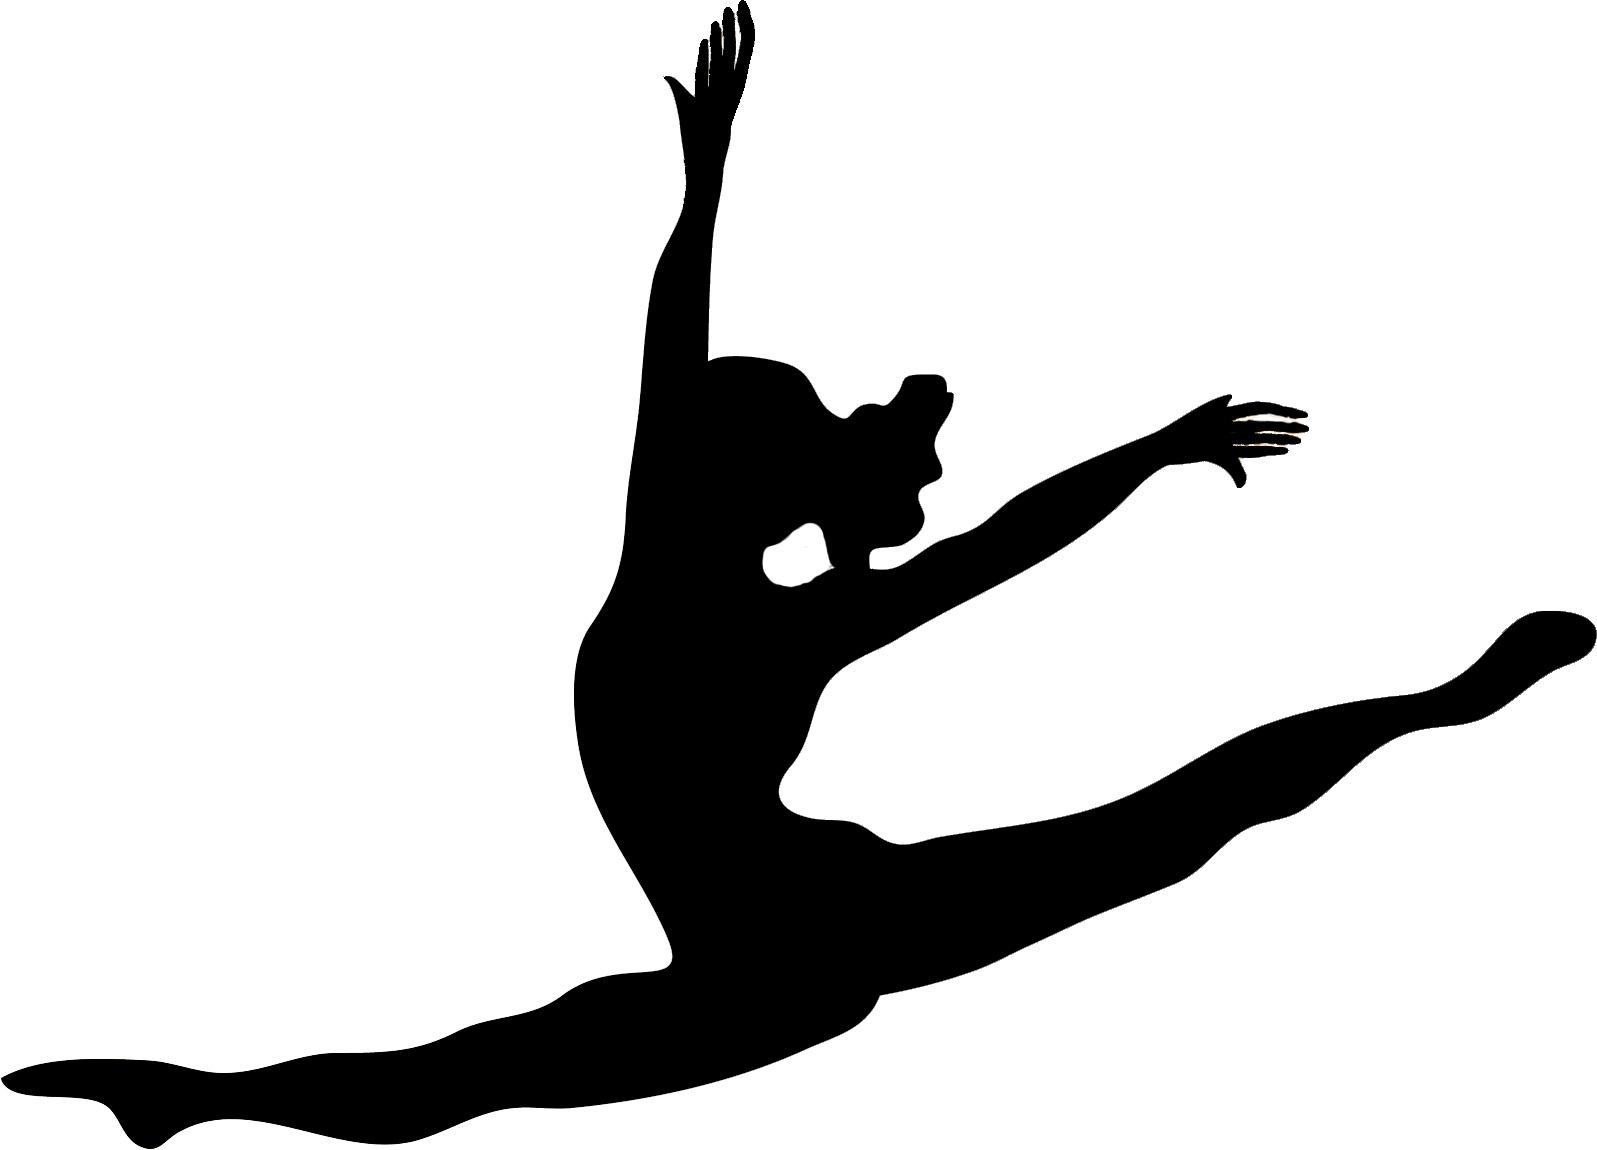 1597x1150 Vibrant Clipart Dancers Silhouette Tap Dancer Panda Free Images